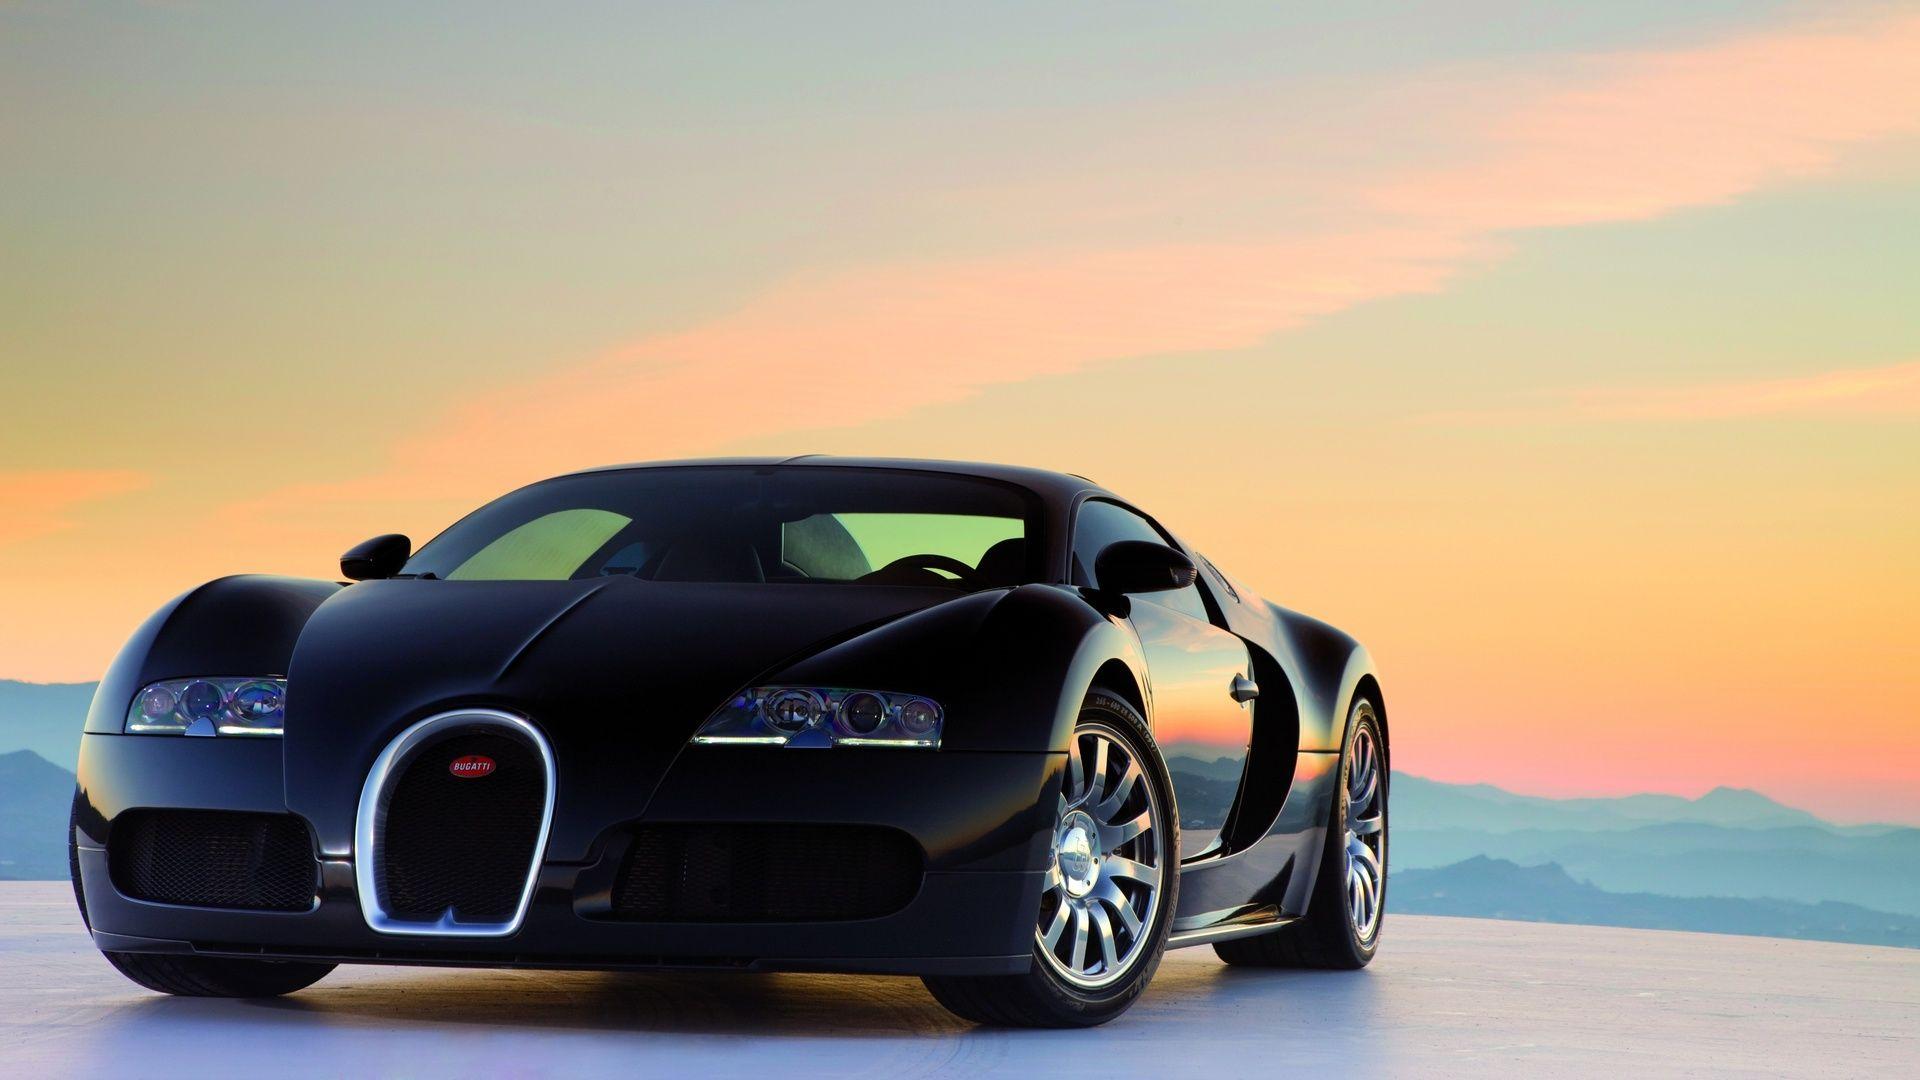 Bugatti Veyron Wallpapers High Quality Download Free Bugatti Veyron Bugatti Wallpapers Bugatti